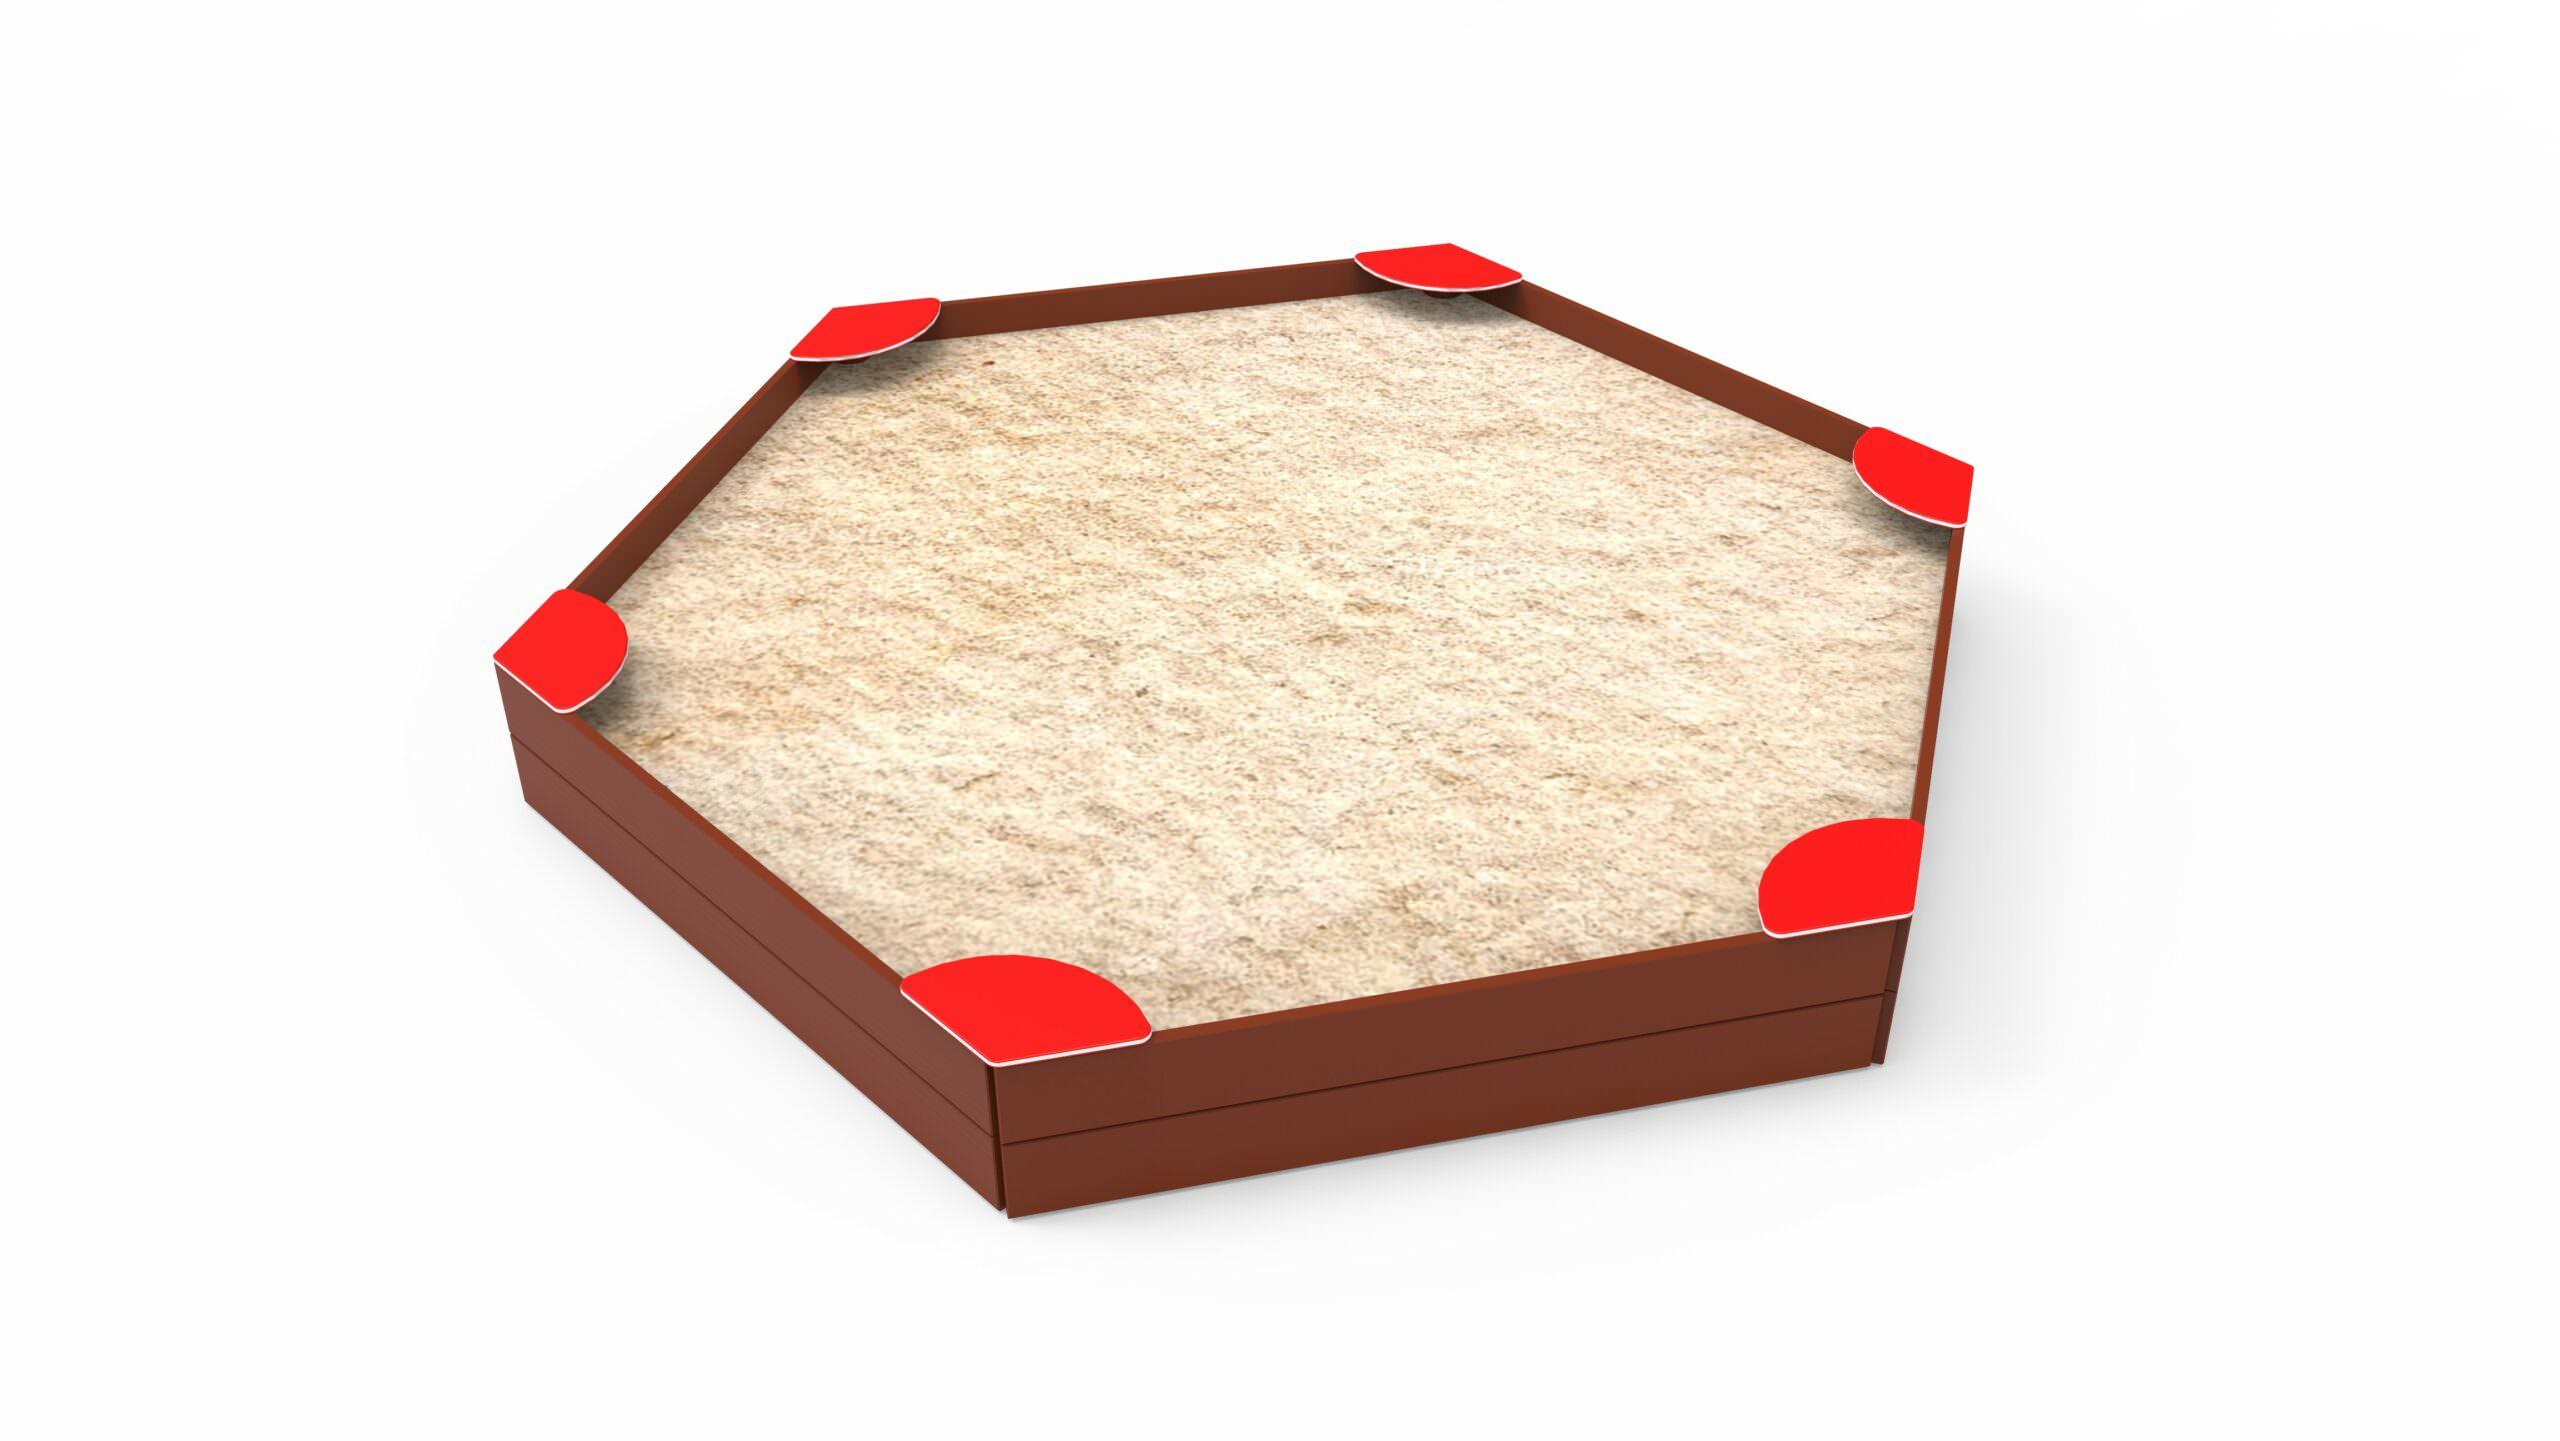 Hexagonal Sandbox 1,8 M